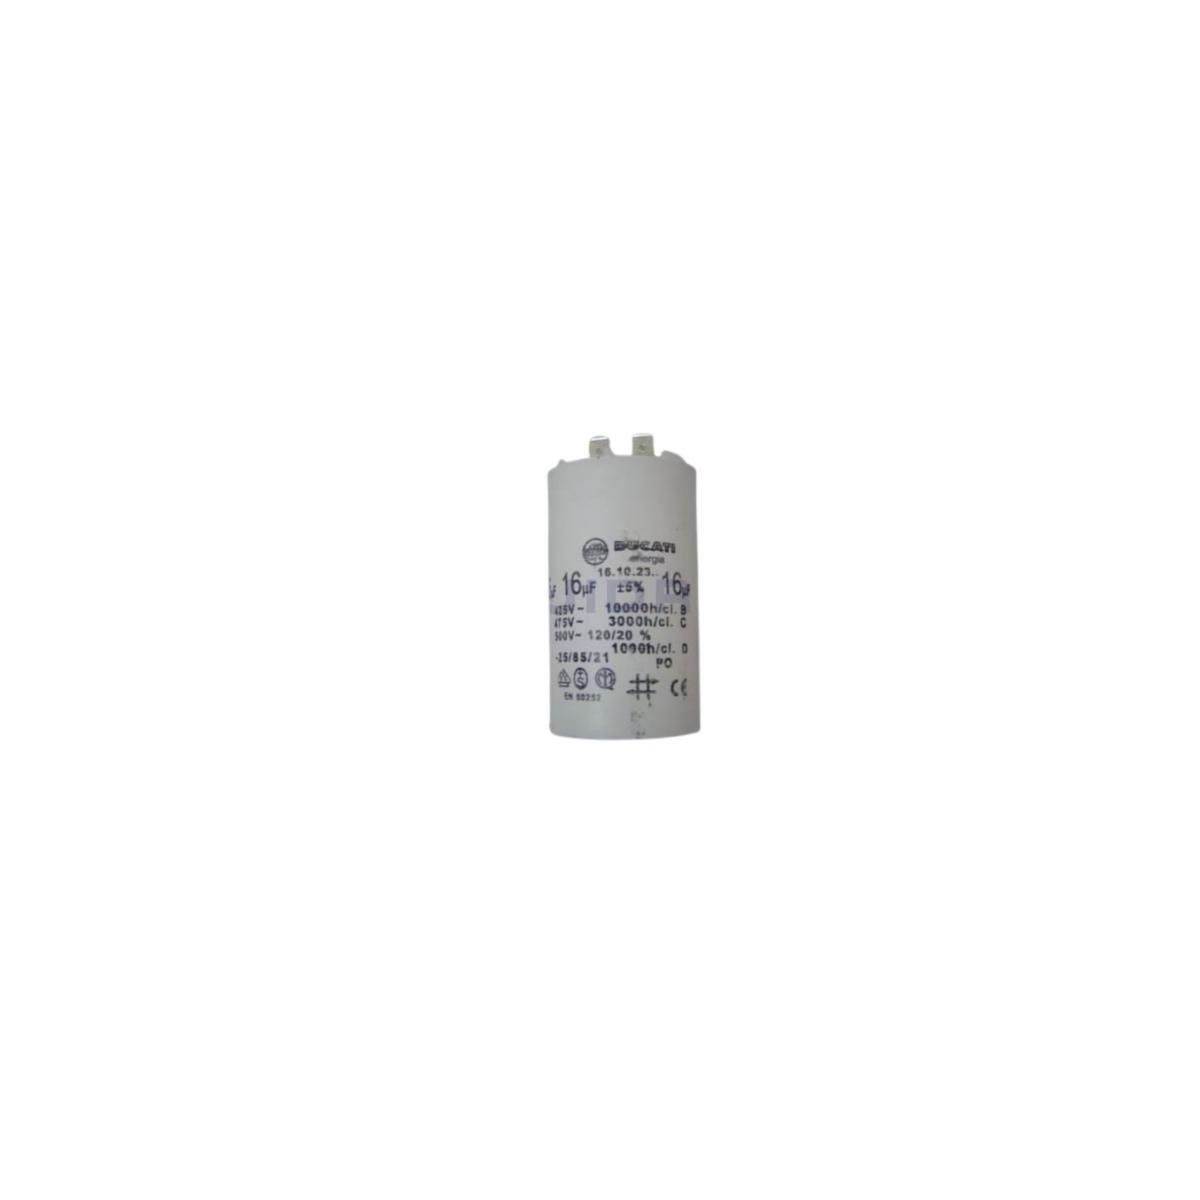 Capacitor 16 UF 1 CV